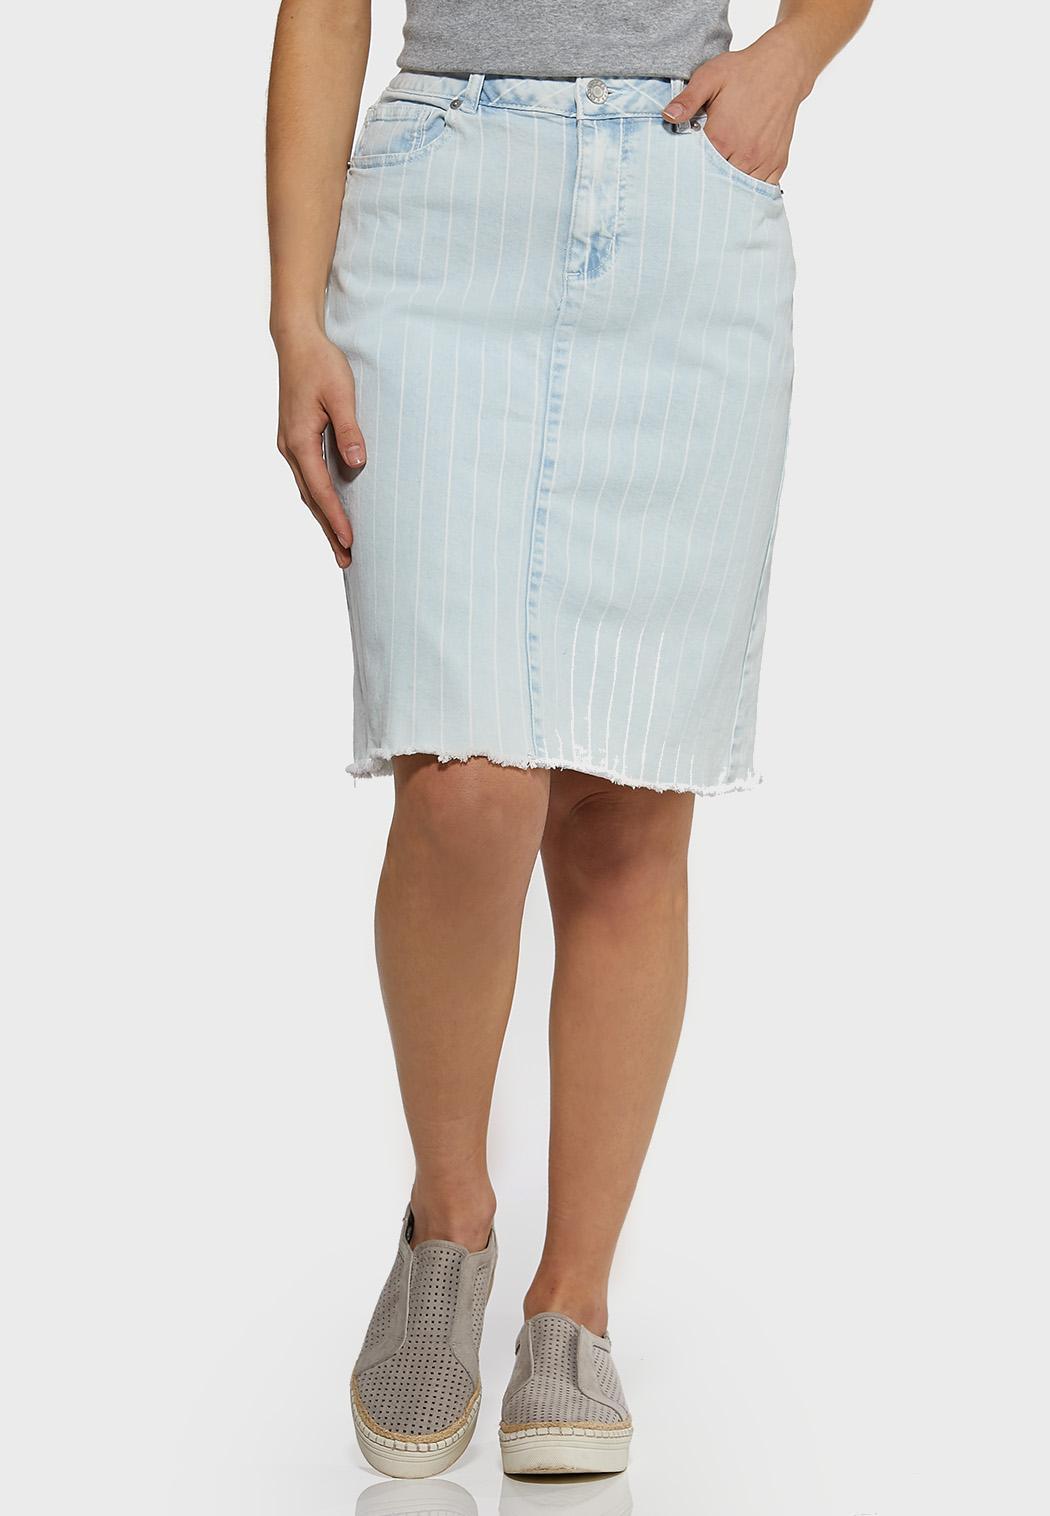 Plus Size Striped Light Wash Denim Skirt